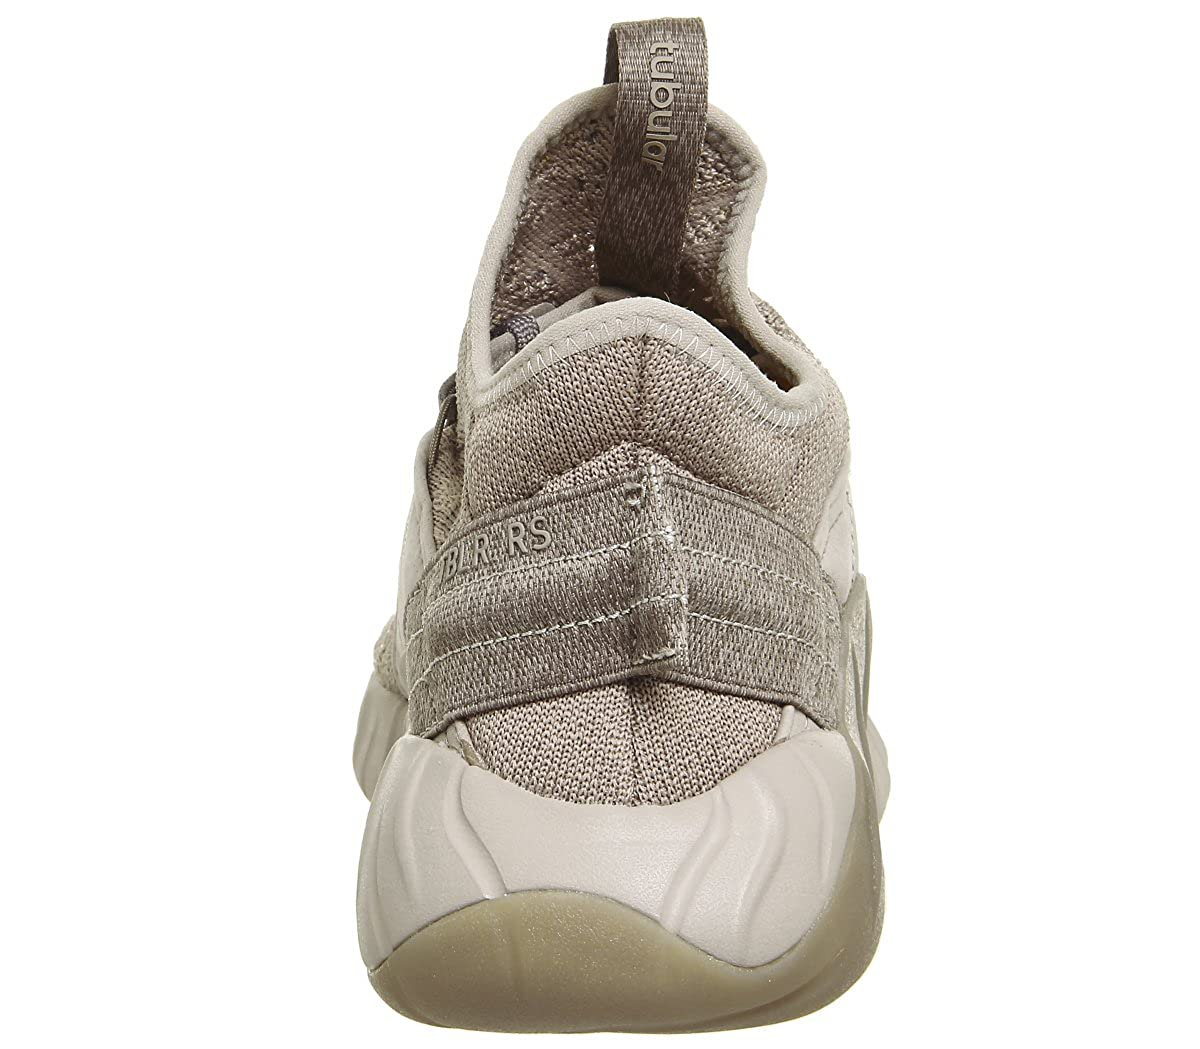 outlet store 6f4b2 613e1 Amazon.com   adidas Originals Men s Sneaker Tubular Rise Con Tomaia  Primeknit 10(UK)-10½(US) Beige   Fashion Sneakers